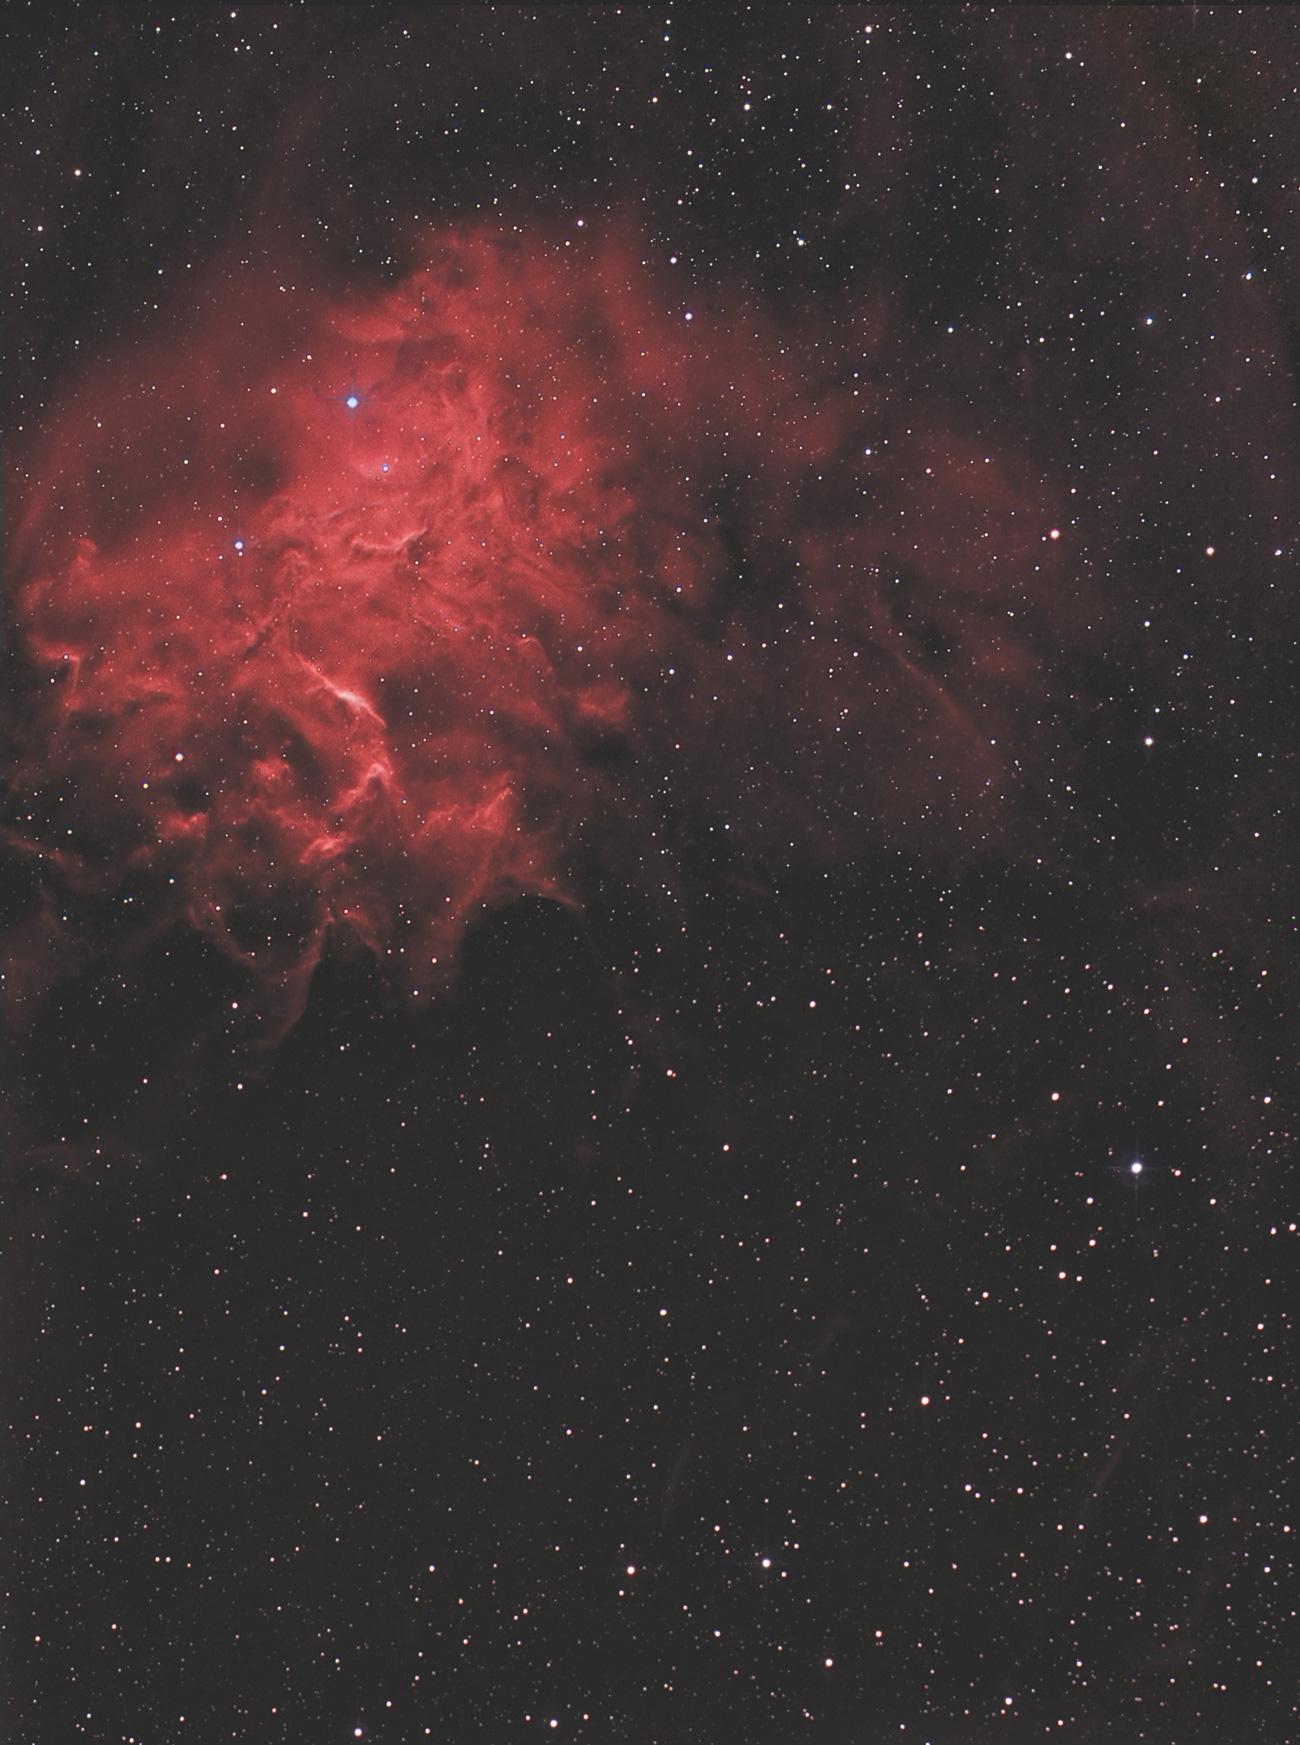 Ciel profond d'hiver - Page 12 Ic405_1300_4